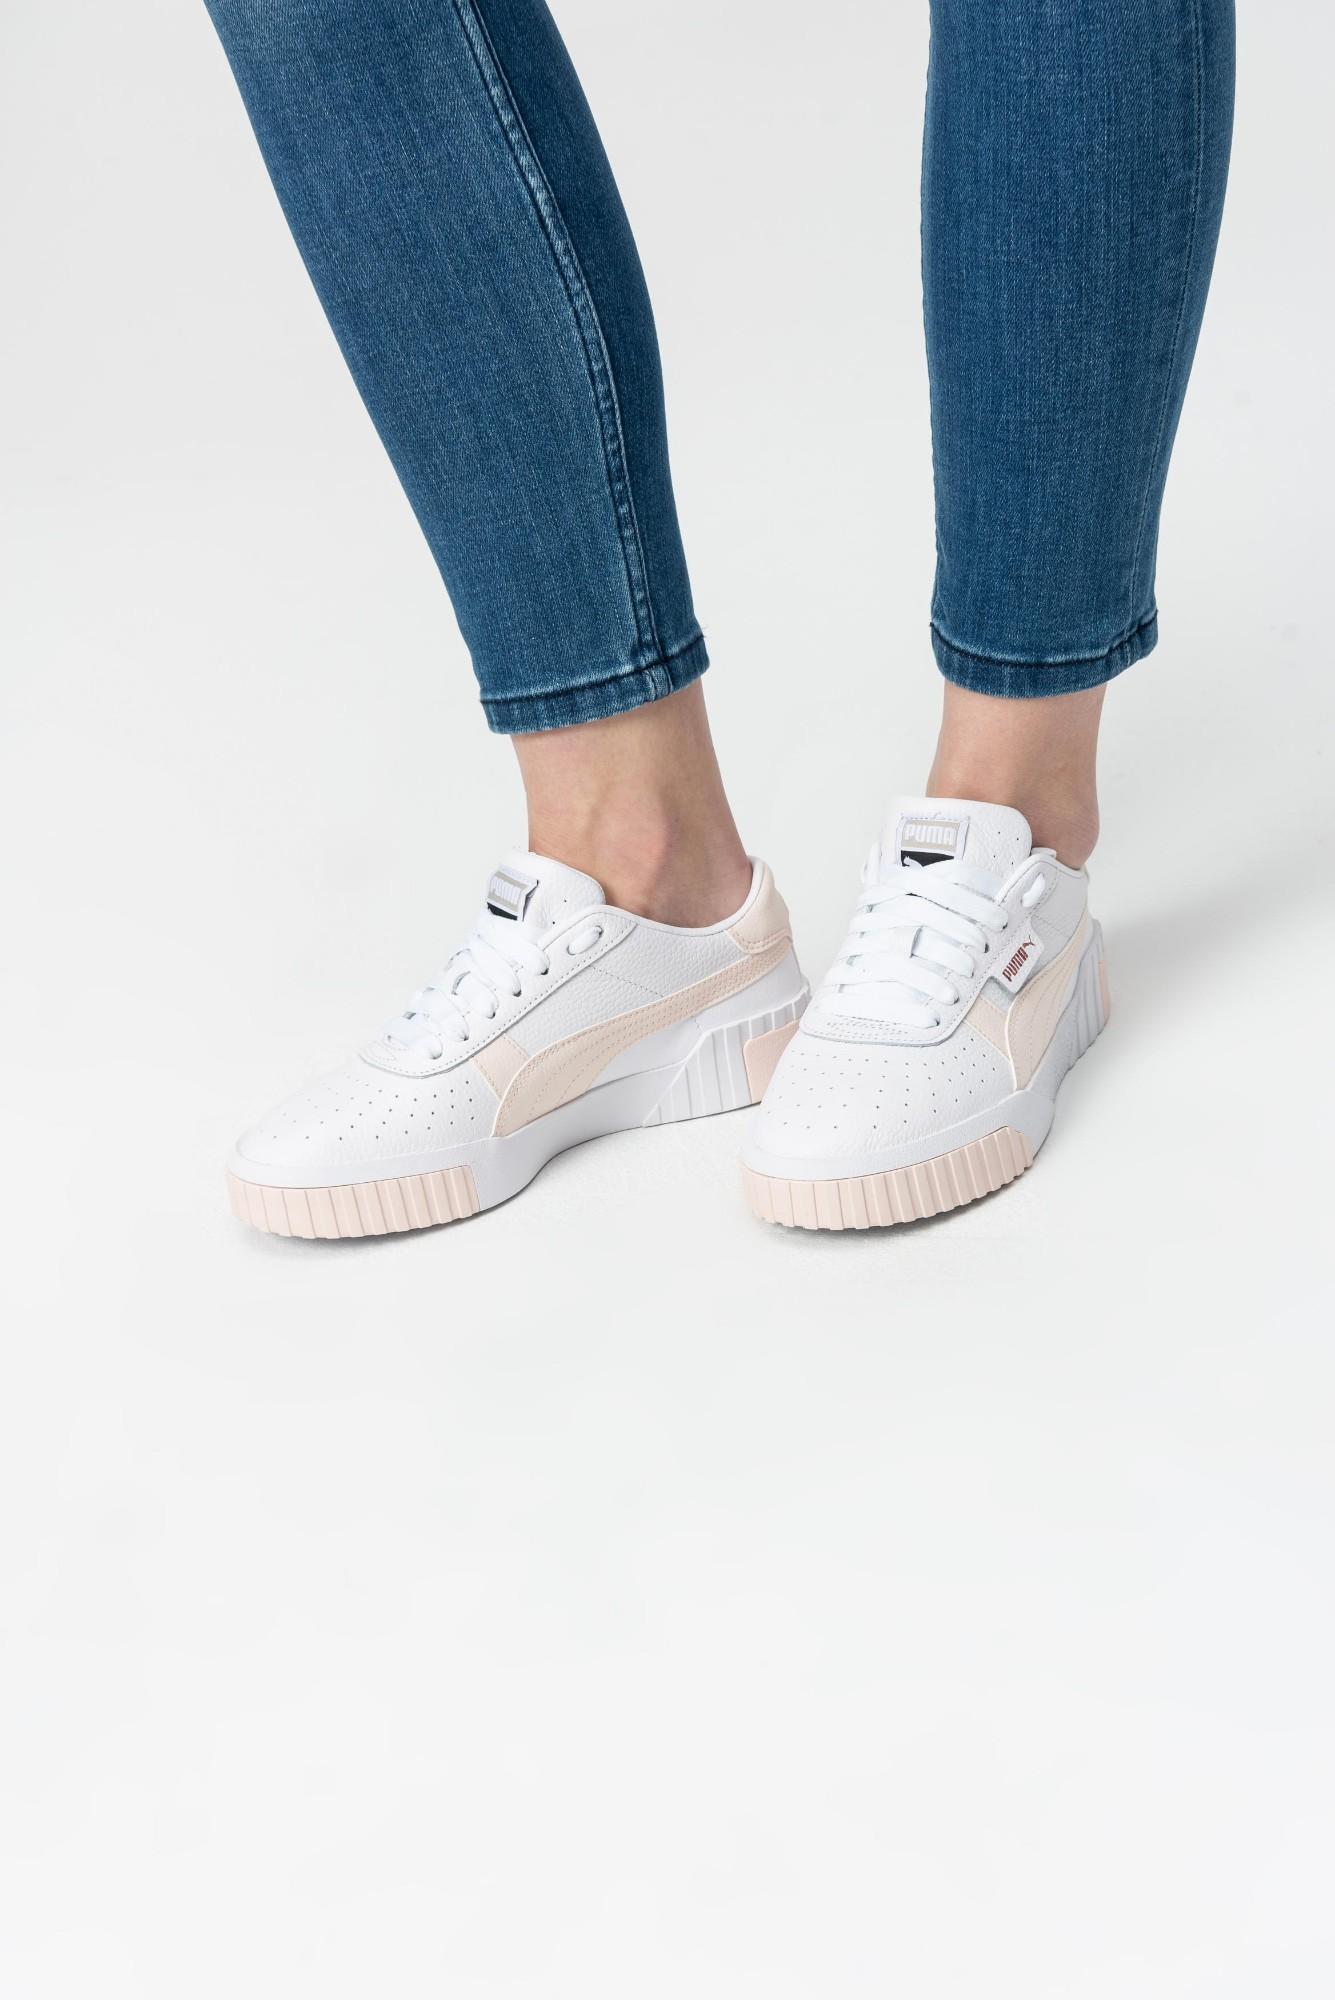 puma ladies casual shoes